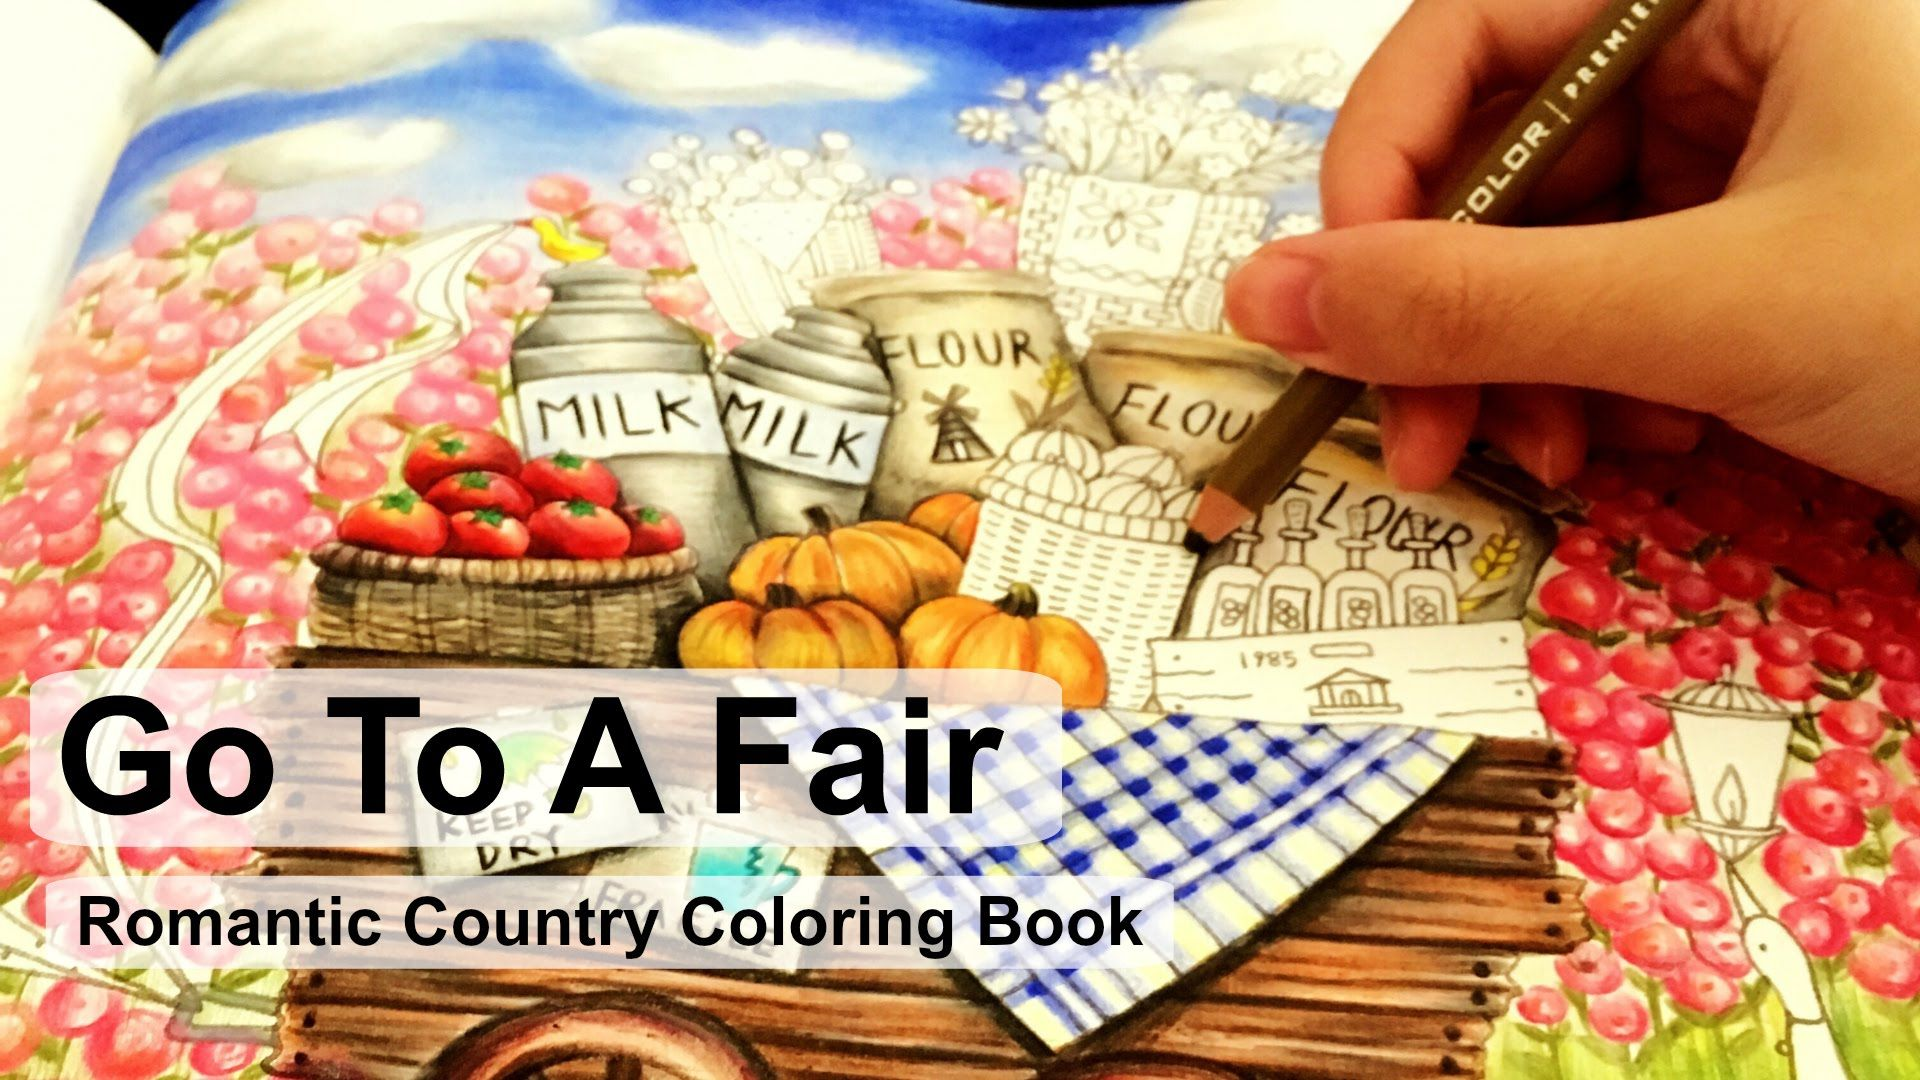 Watercolor pencils for adult coloring book - Go To A Fair Adult Coloring Book Romantic Country By Eriy Watercolor Pencilsadult